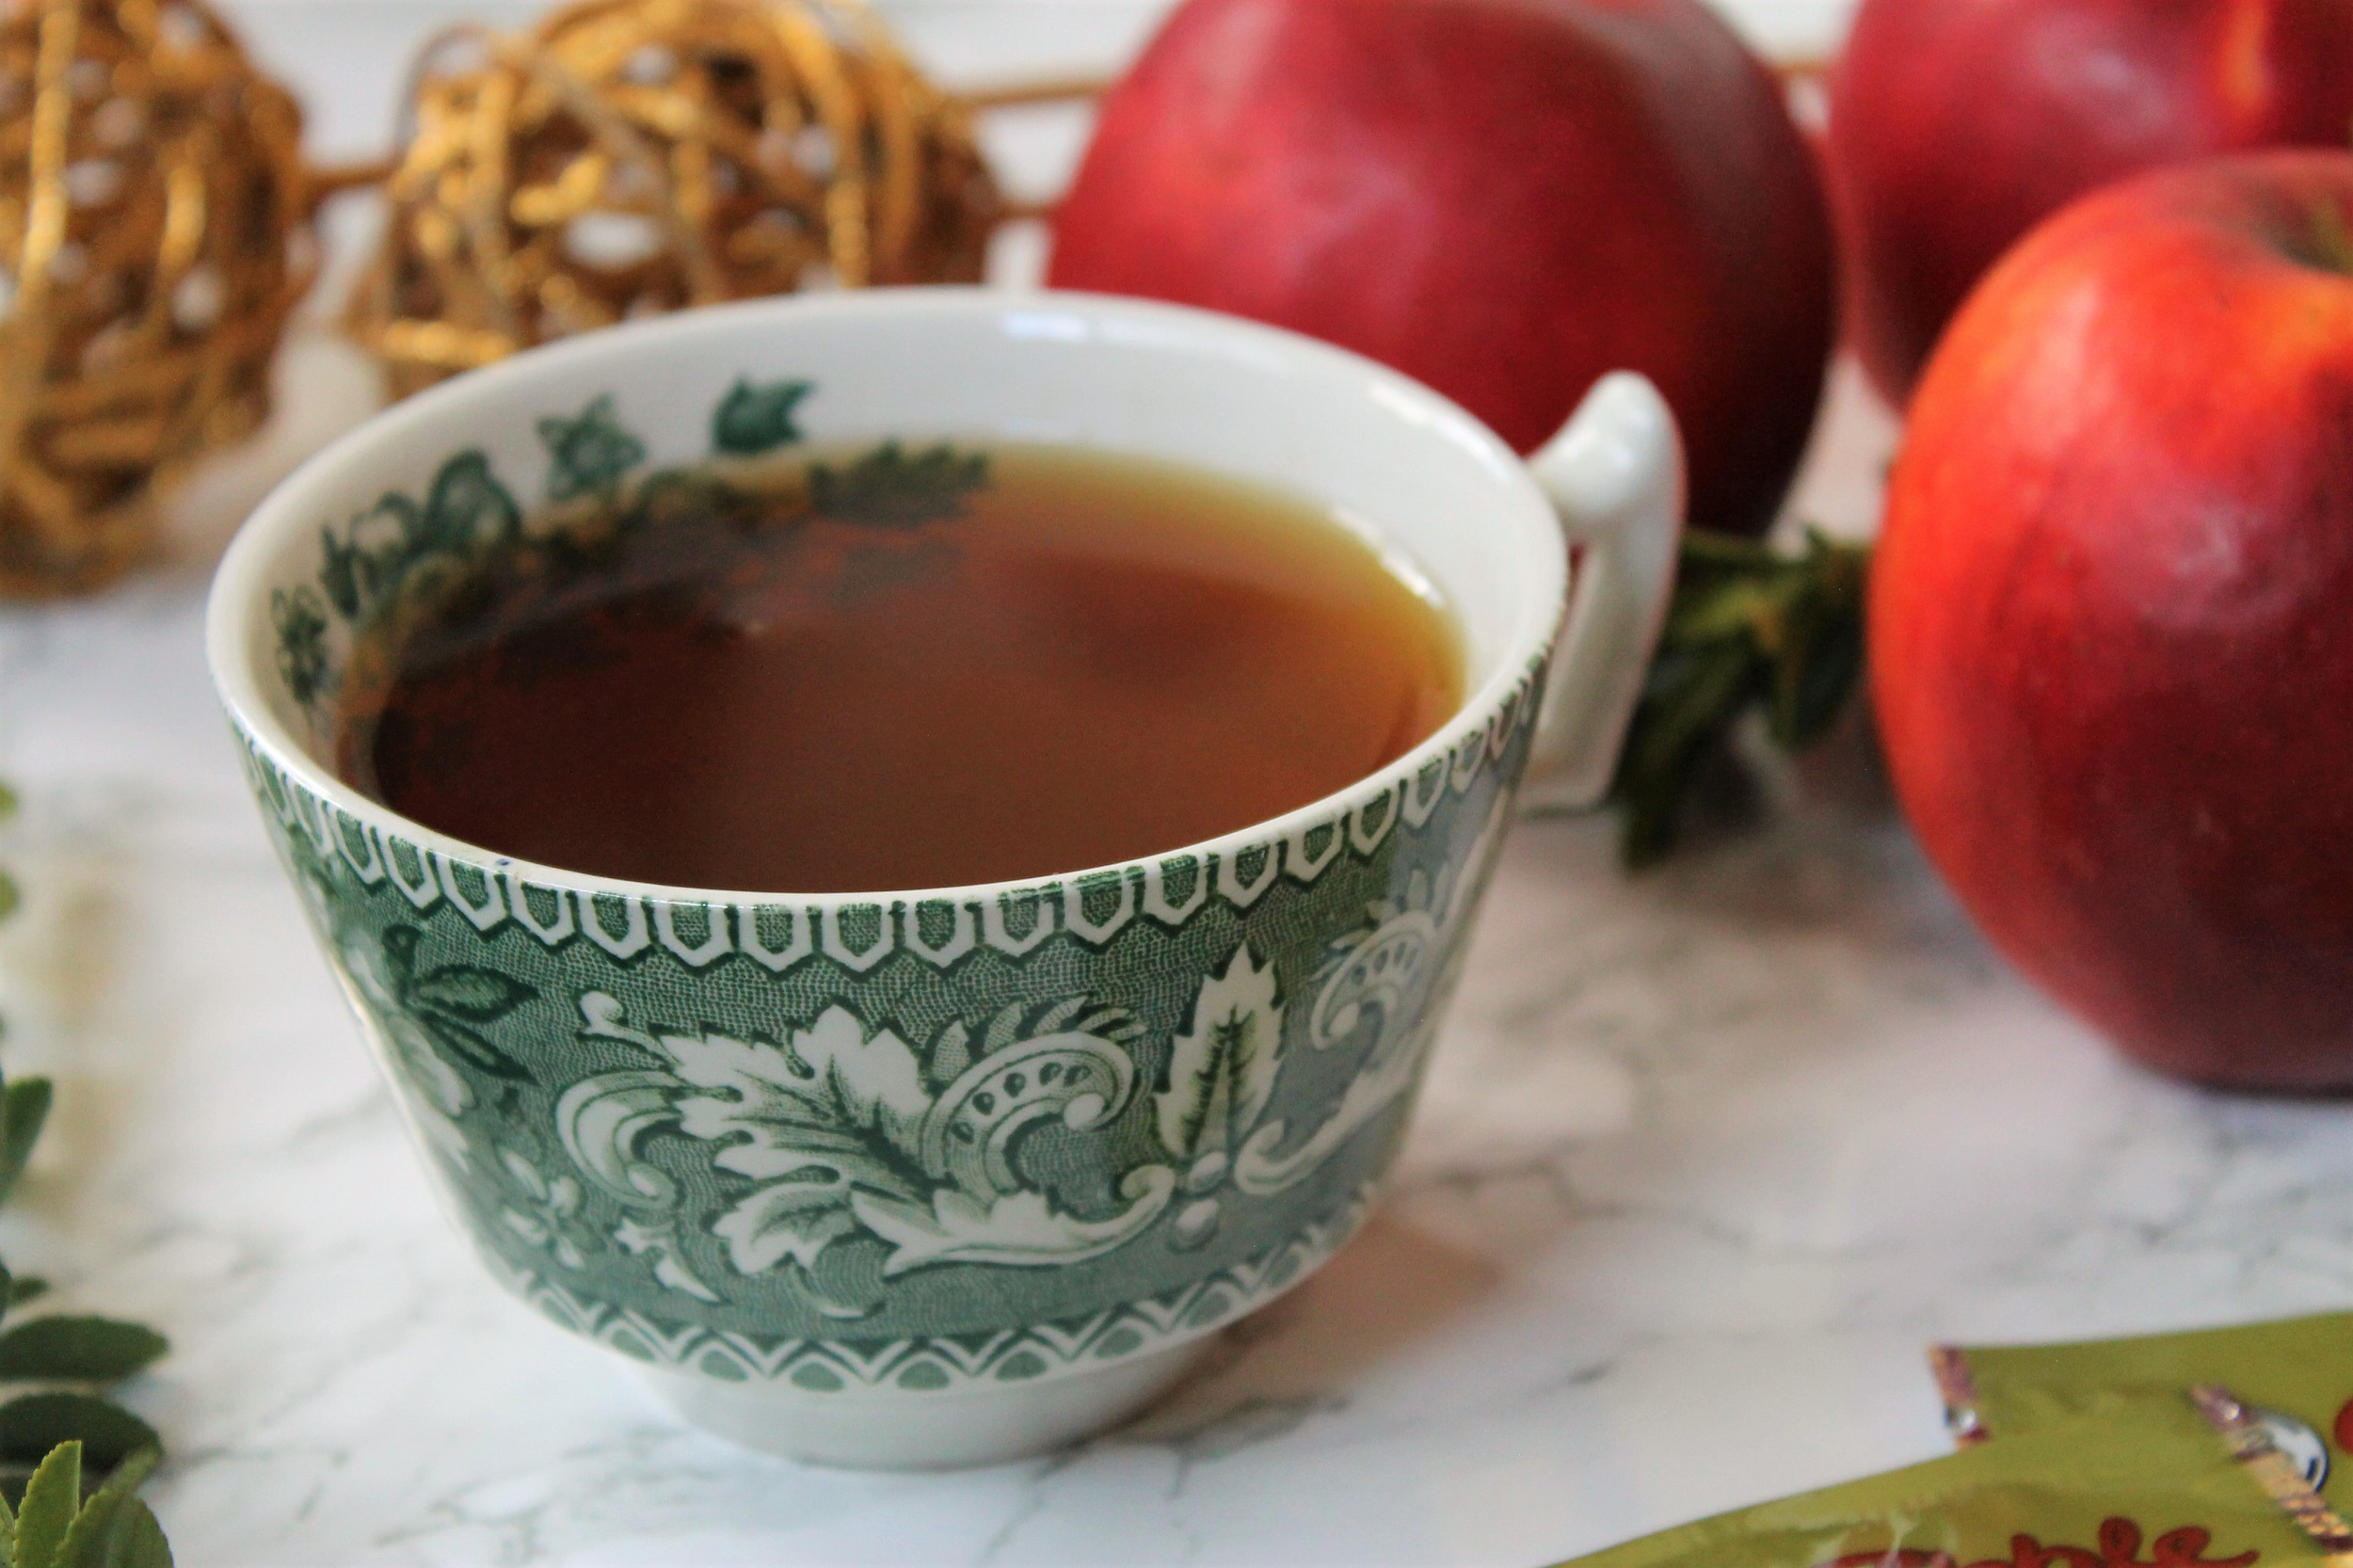 mlesna apple tea in green teacup